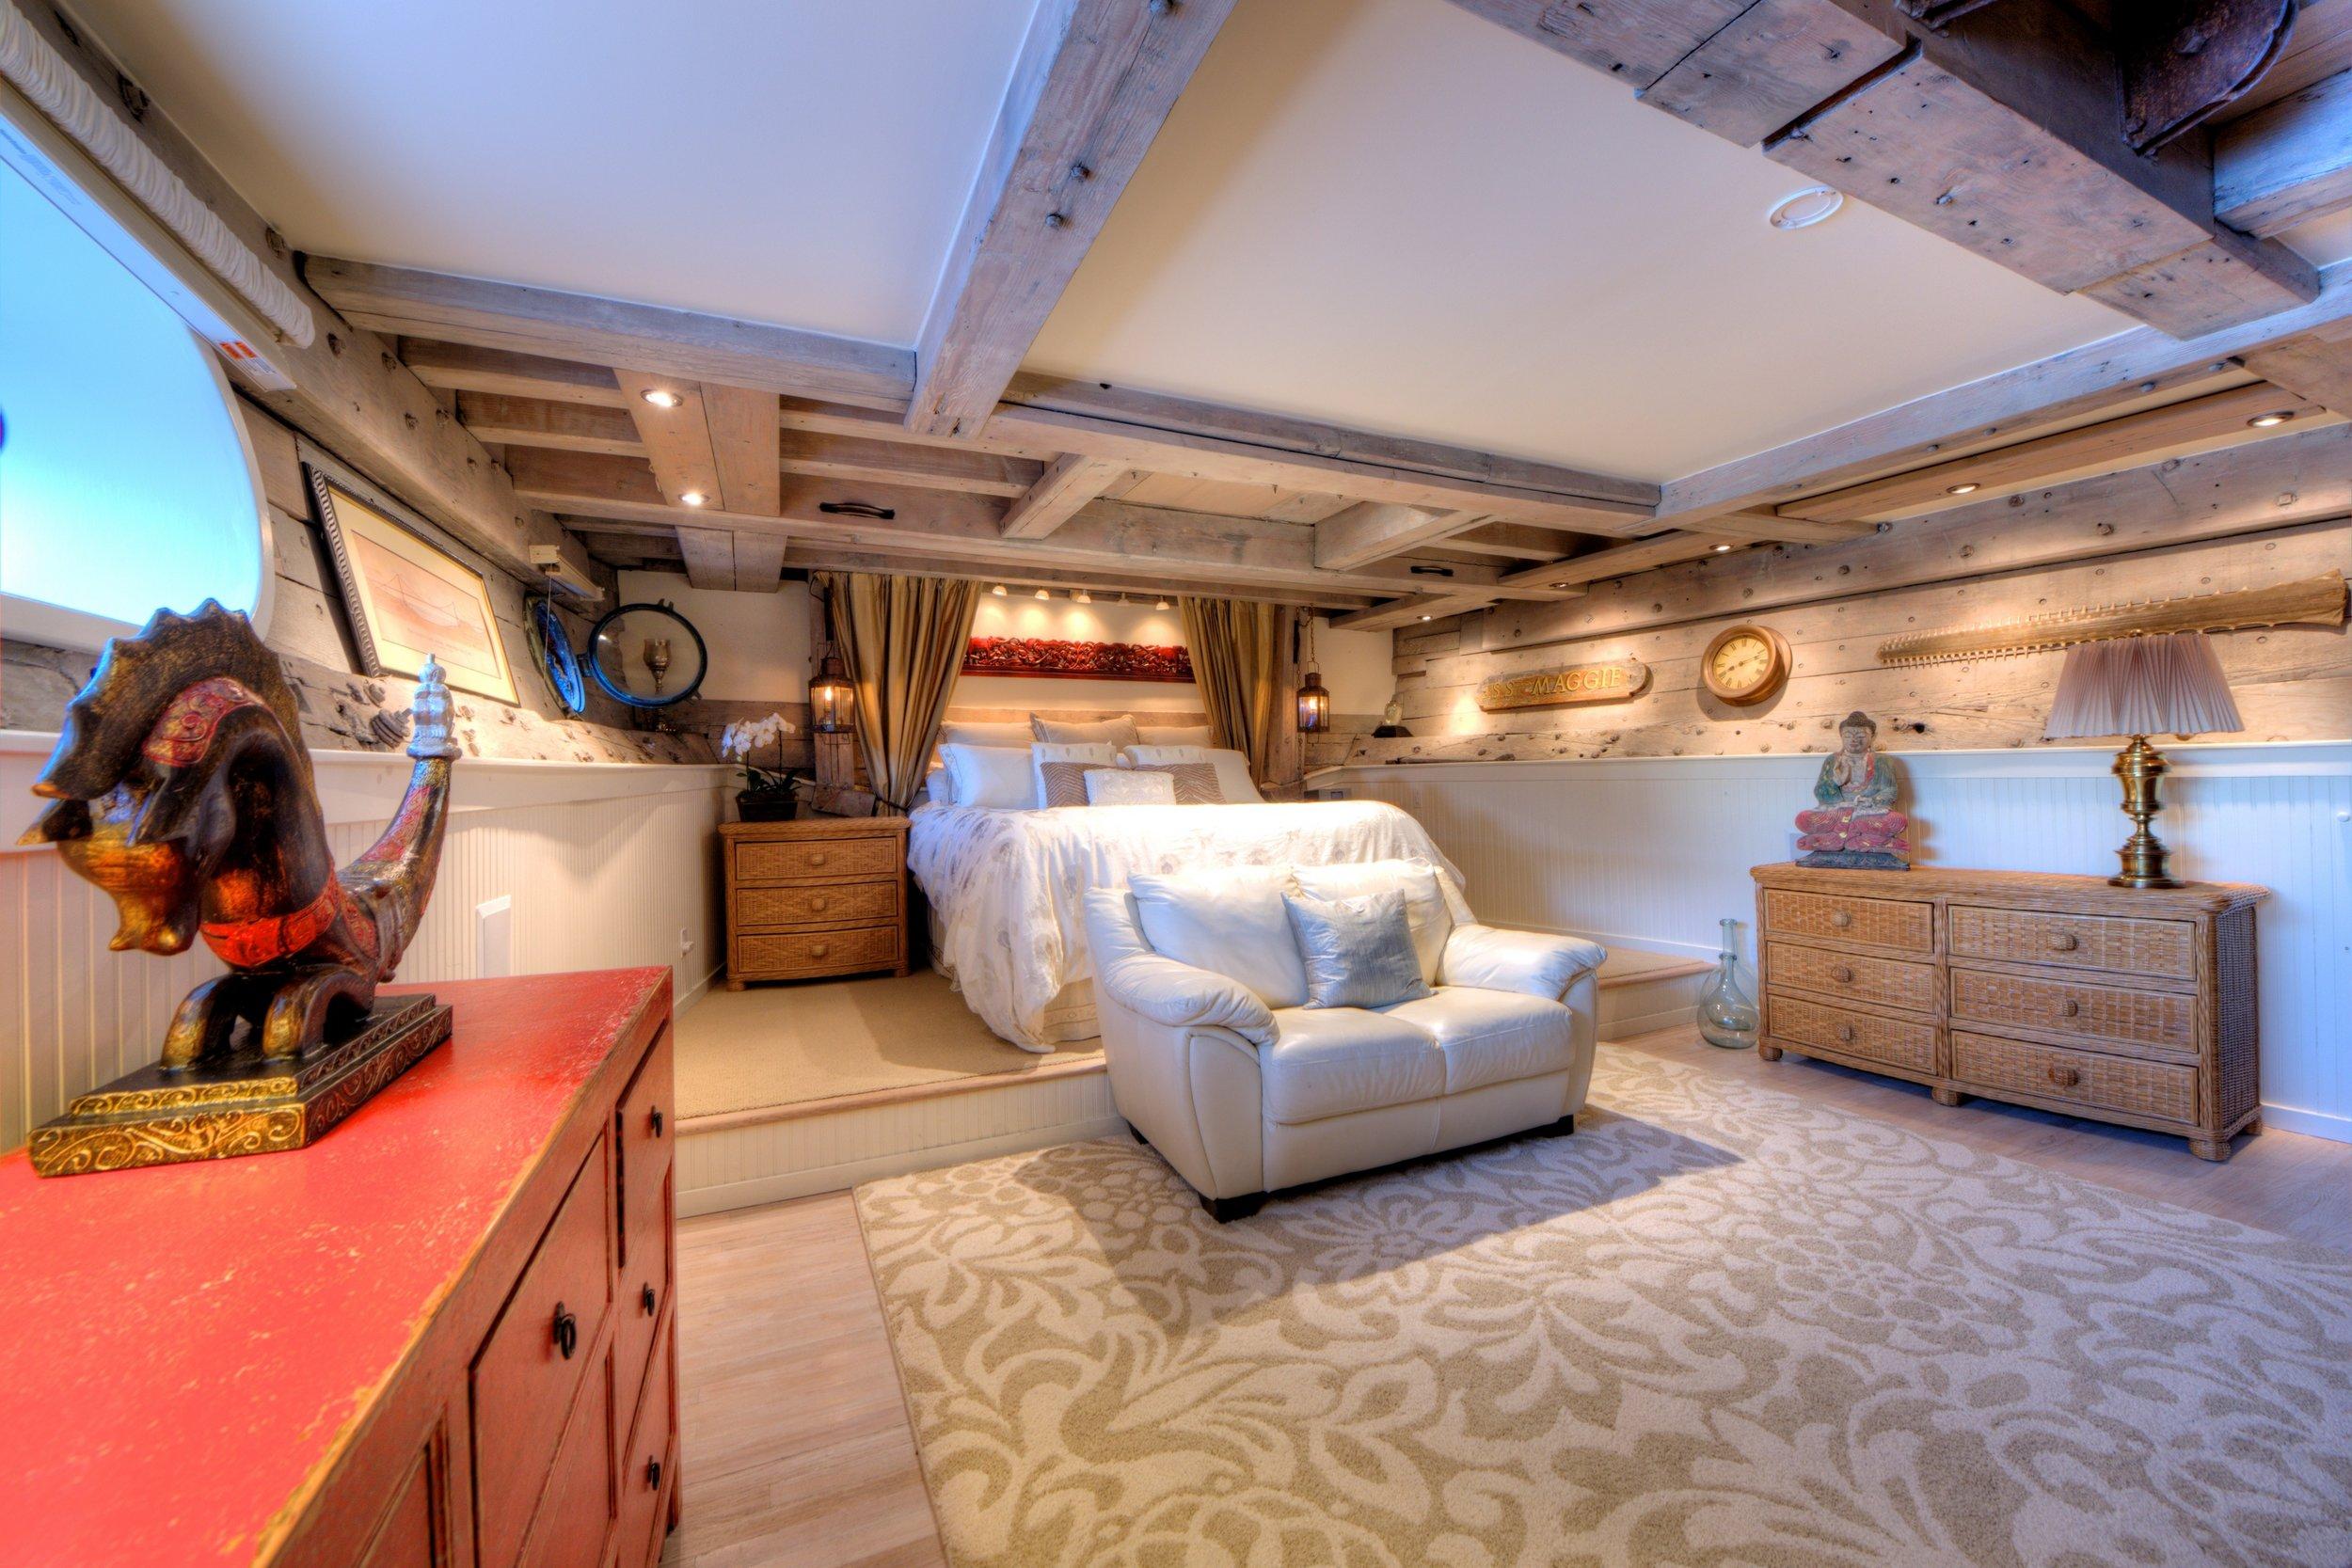 maggie-master-bedroom.jpg